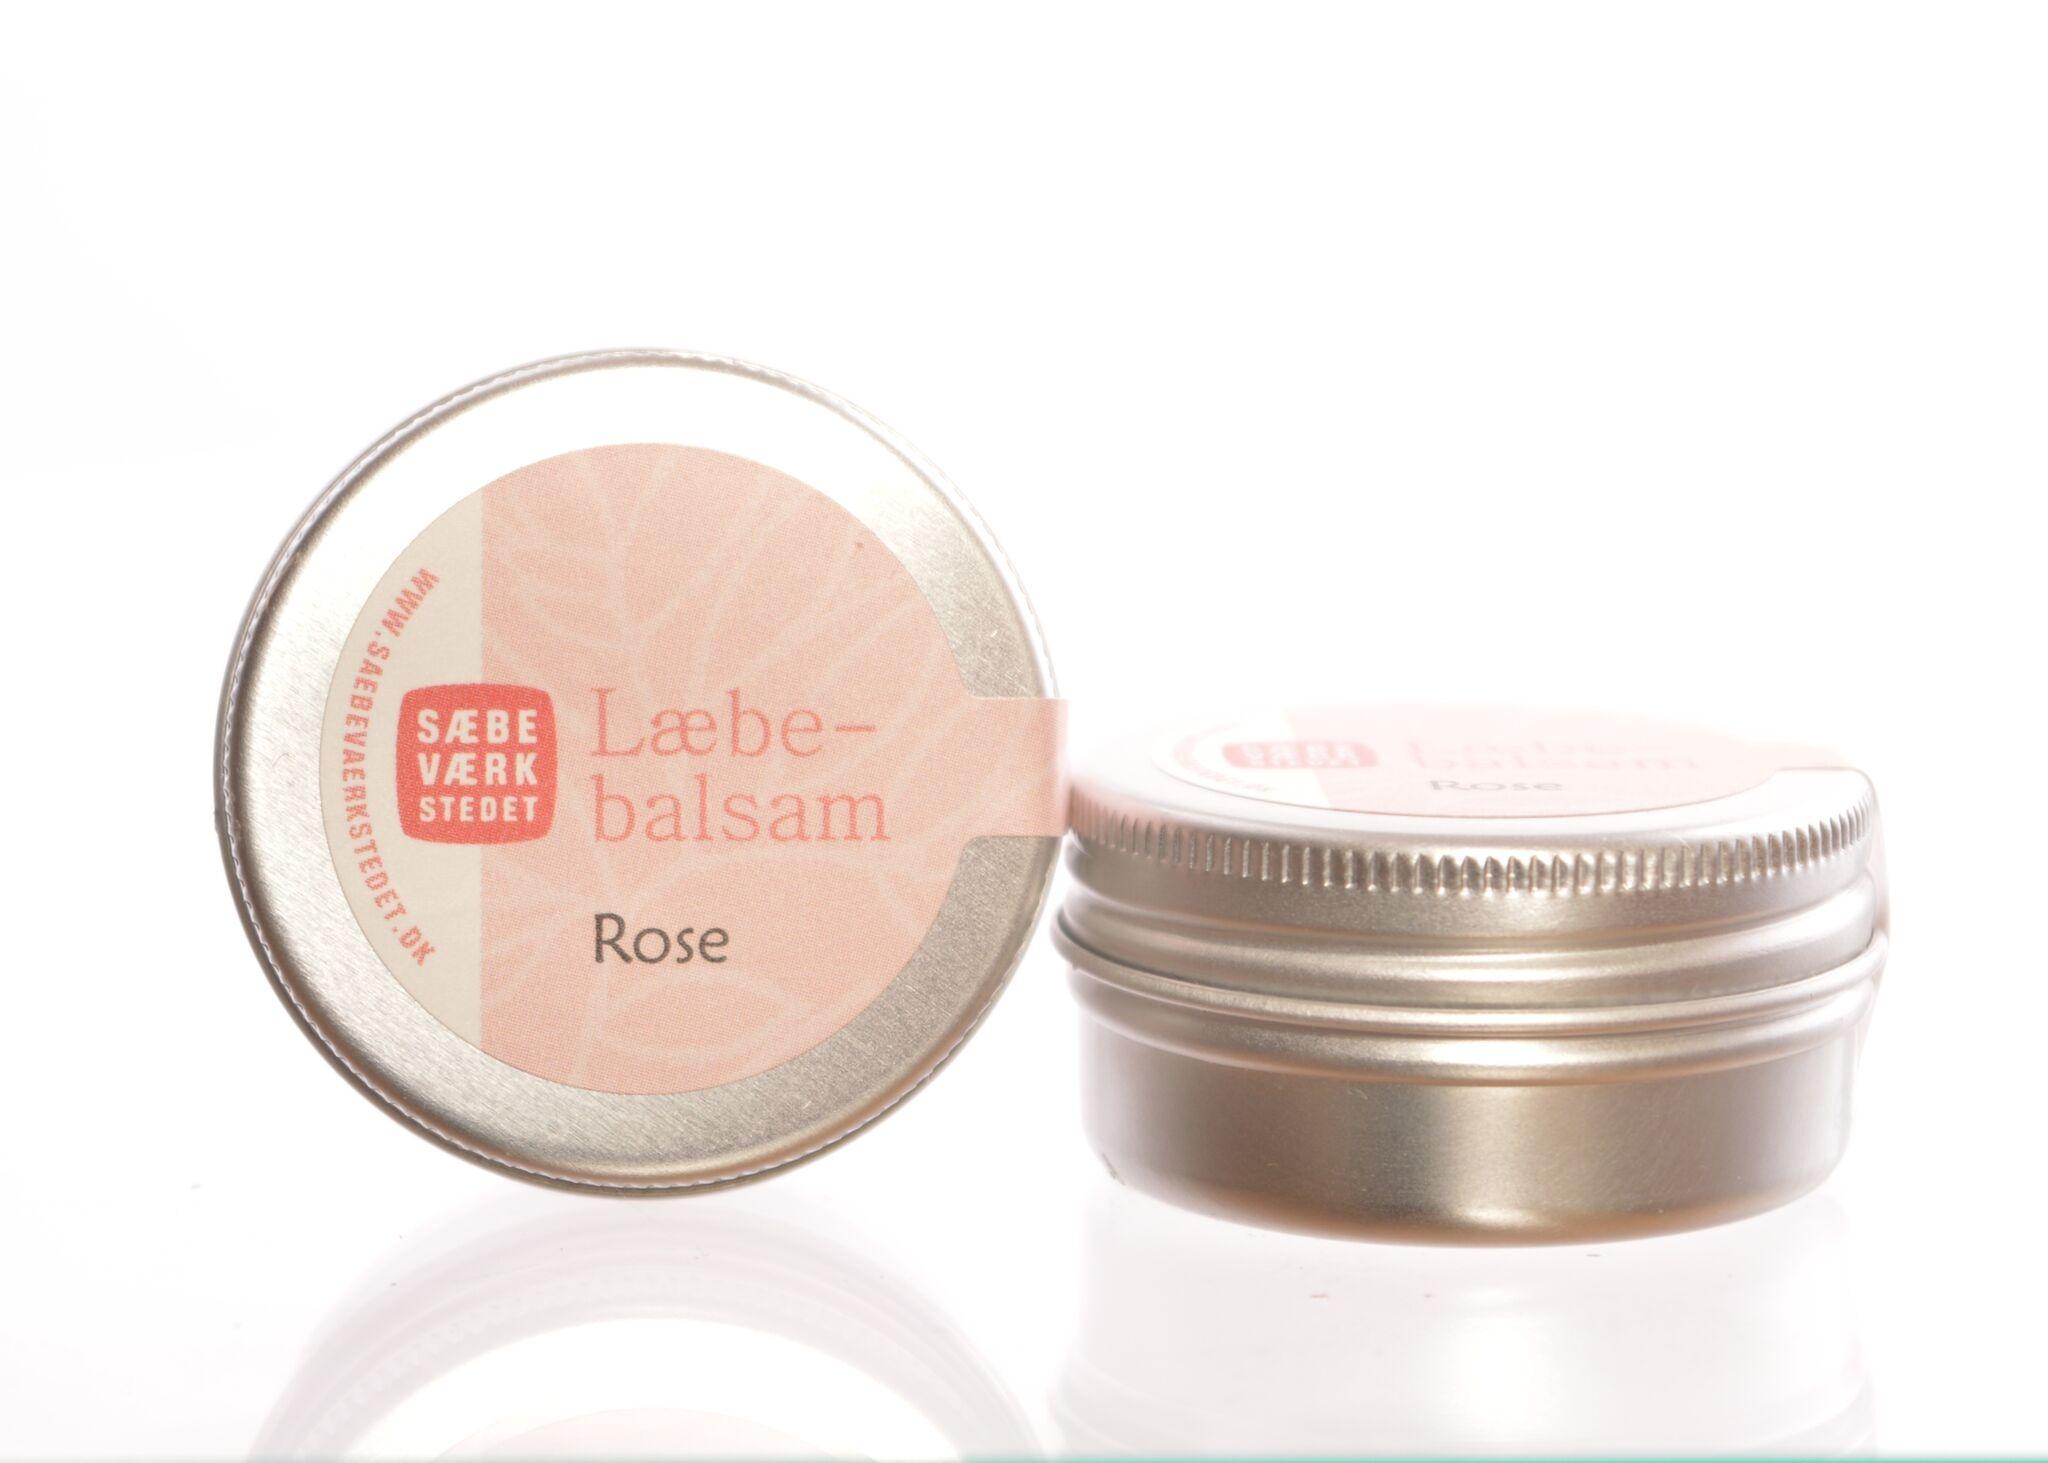 Læbebalsam med Rose - 14 g